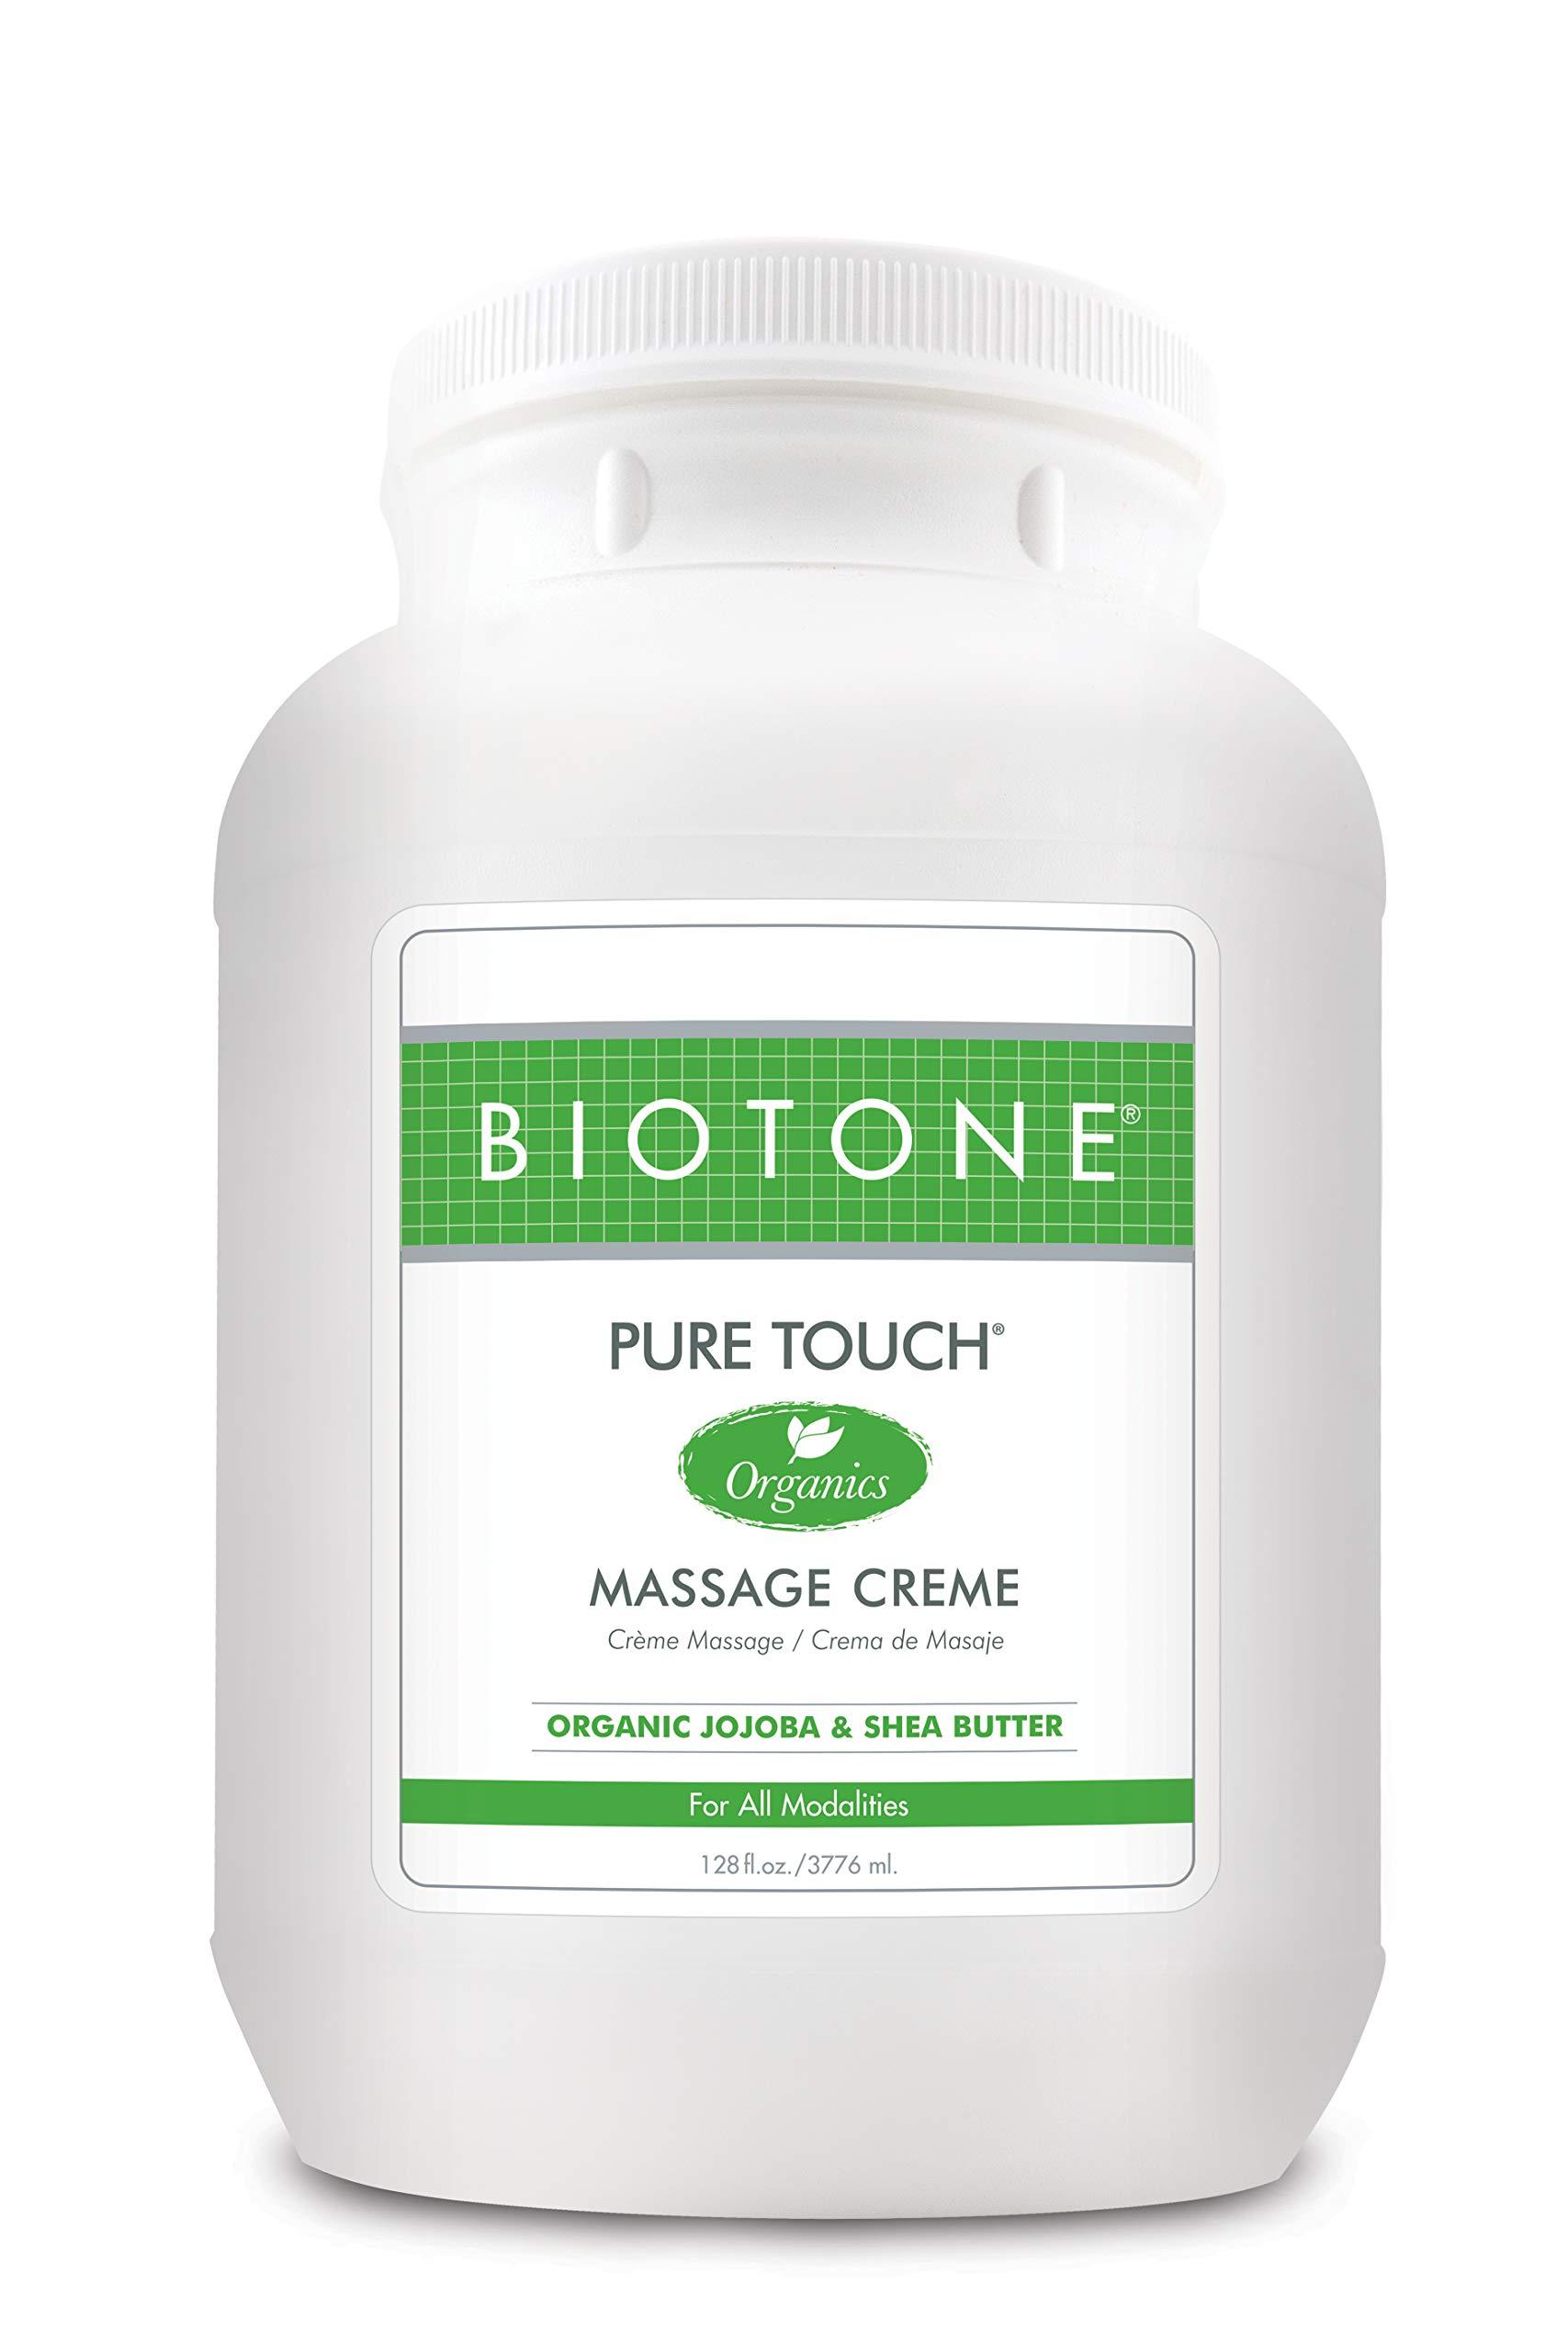 Biotone Pure Touch Organics Massage Creme - 1 Gallon by Biotone